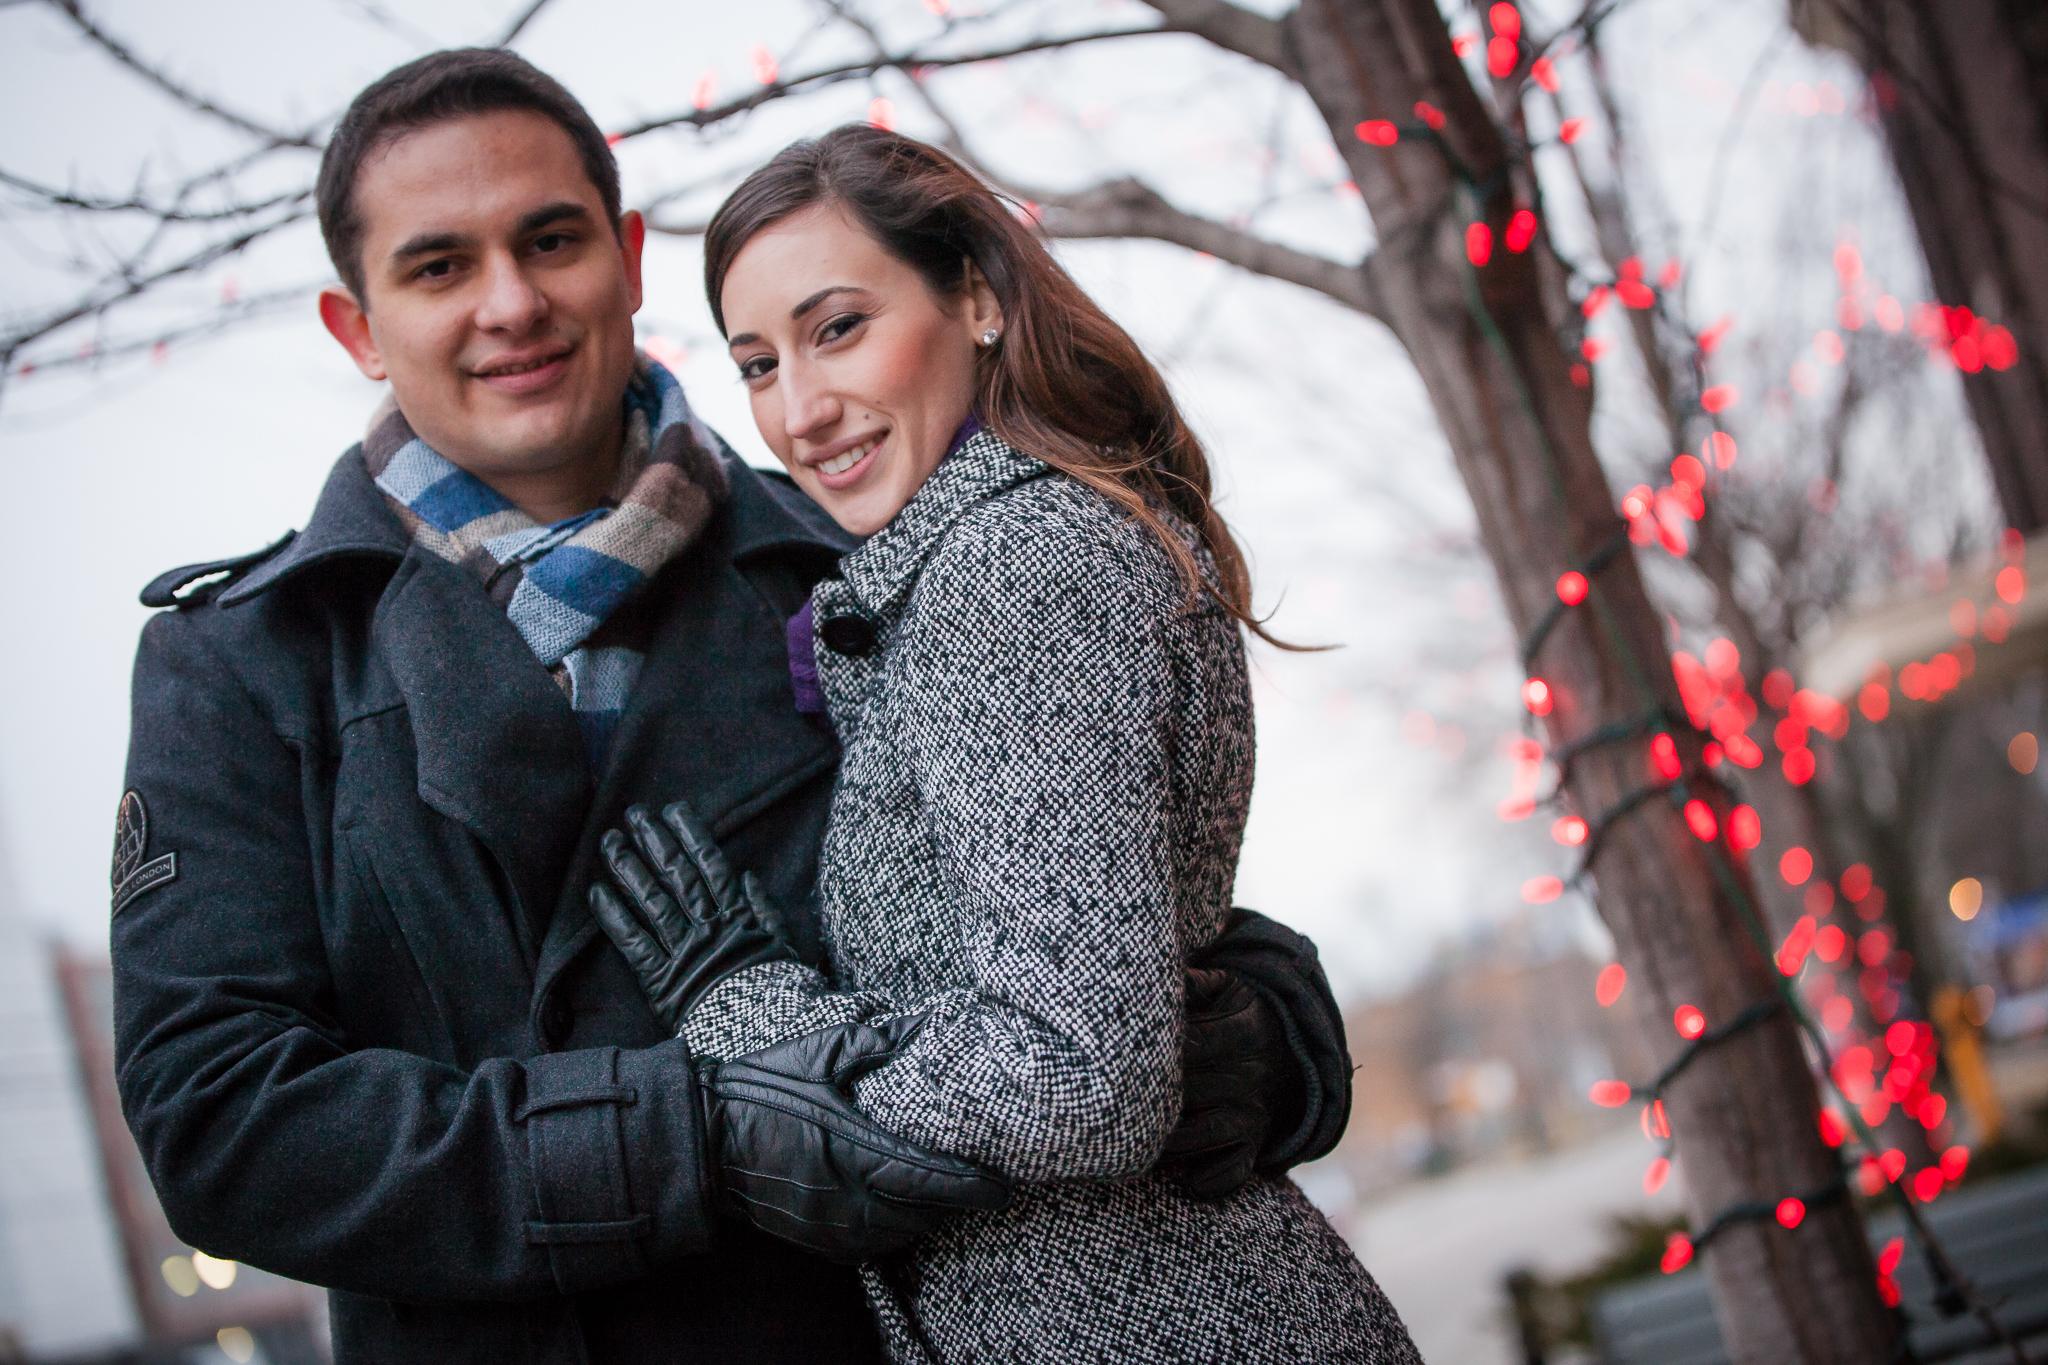 Toronto Wedding Photography - Kristina & Gabe Esession-33.jpg